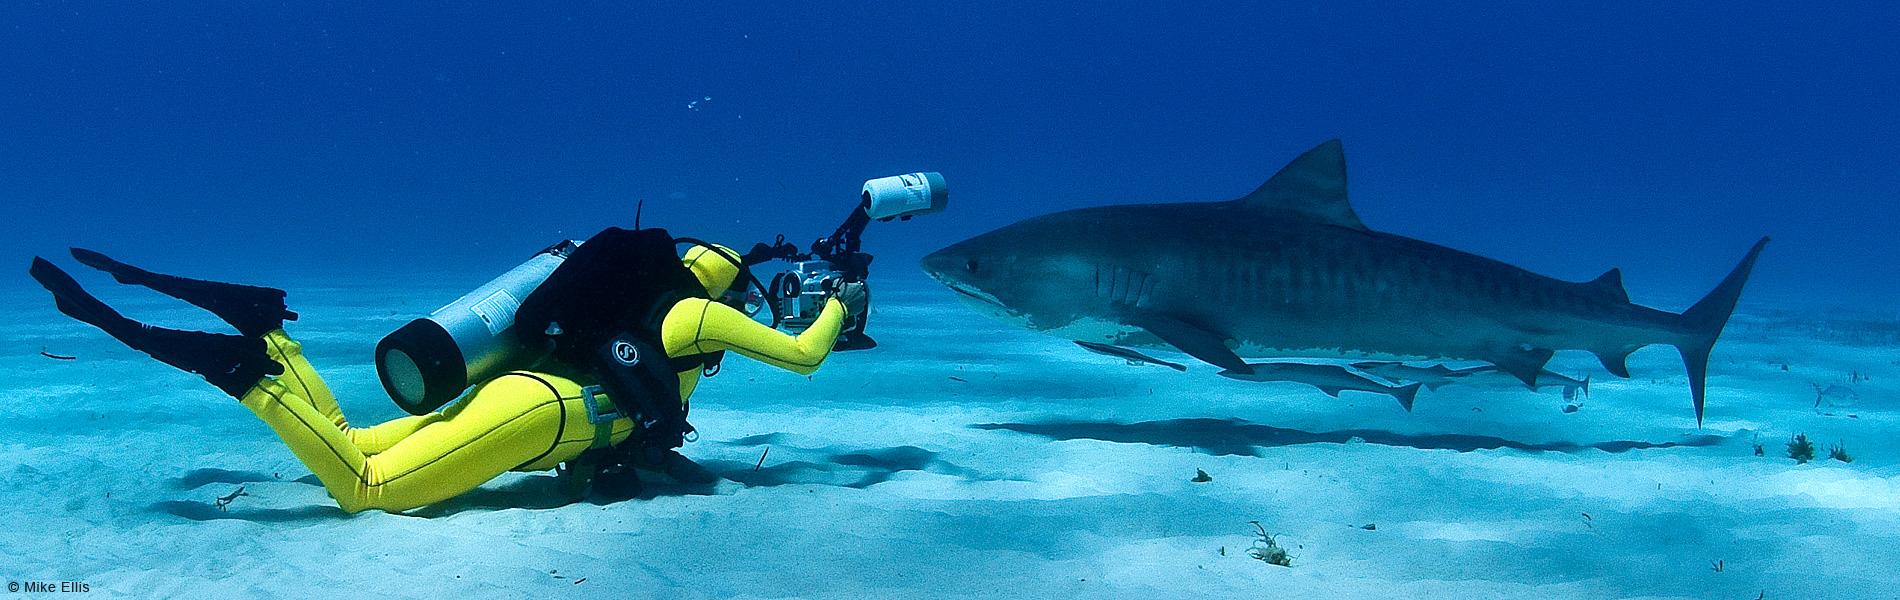 Lesley Rochat Shark Conservationist